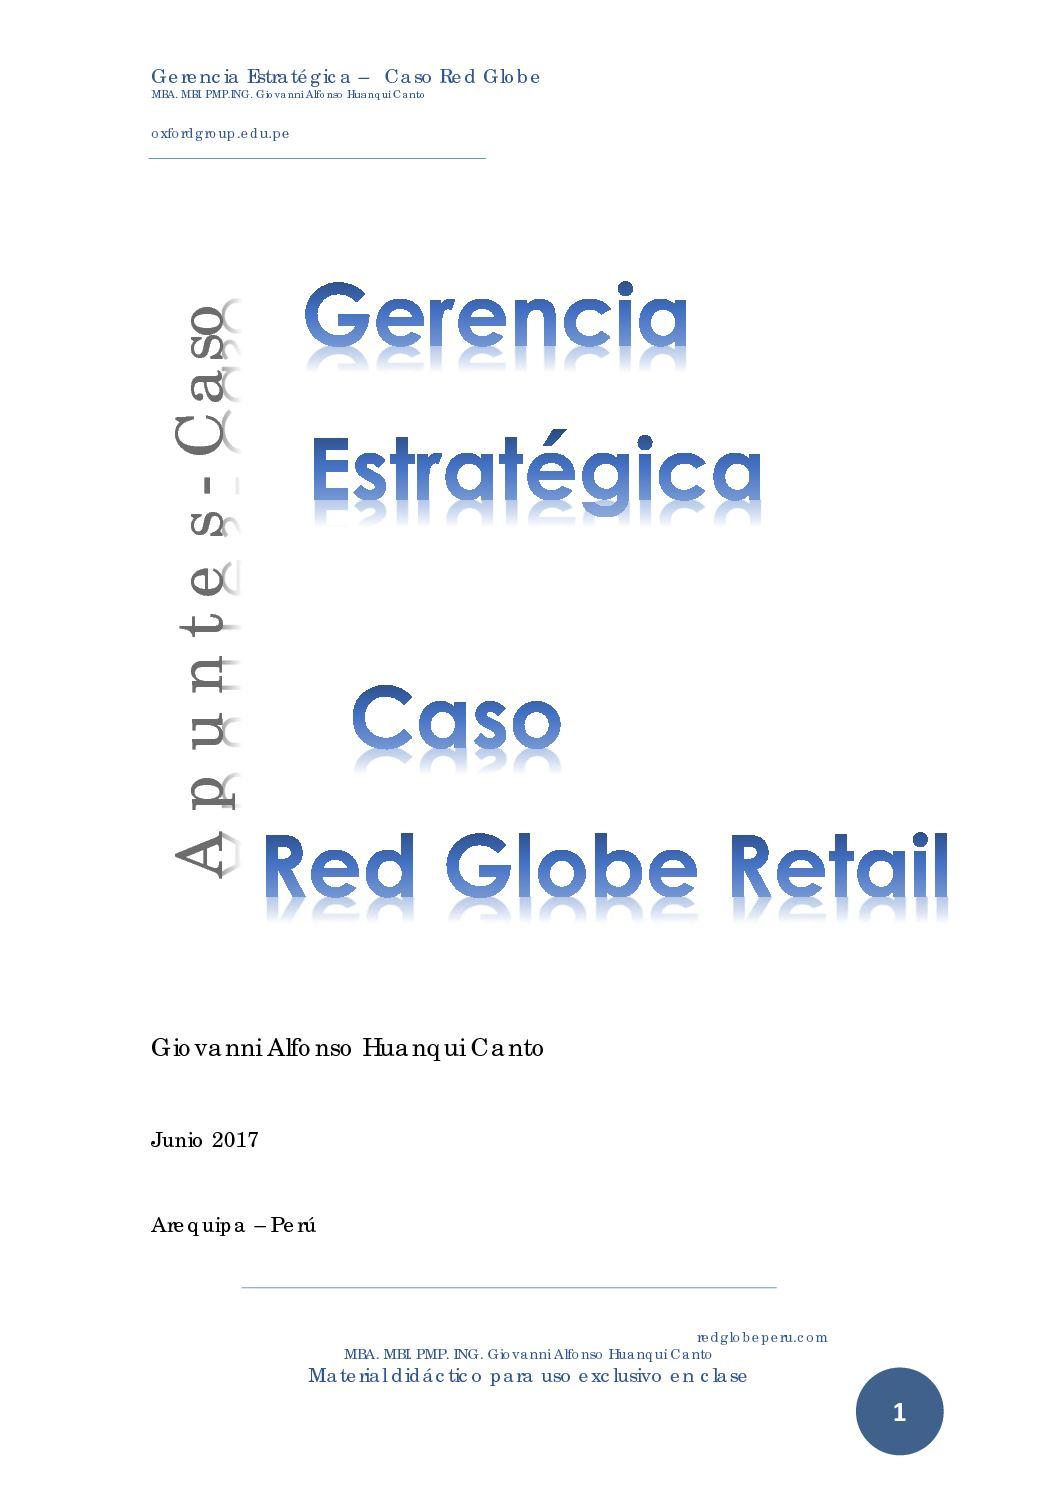 Dirección Estrategica Redglobe Caso Giovanni Alfonso Huanqui Canto  Oxford Group